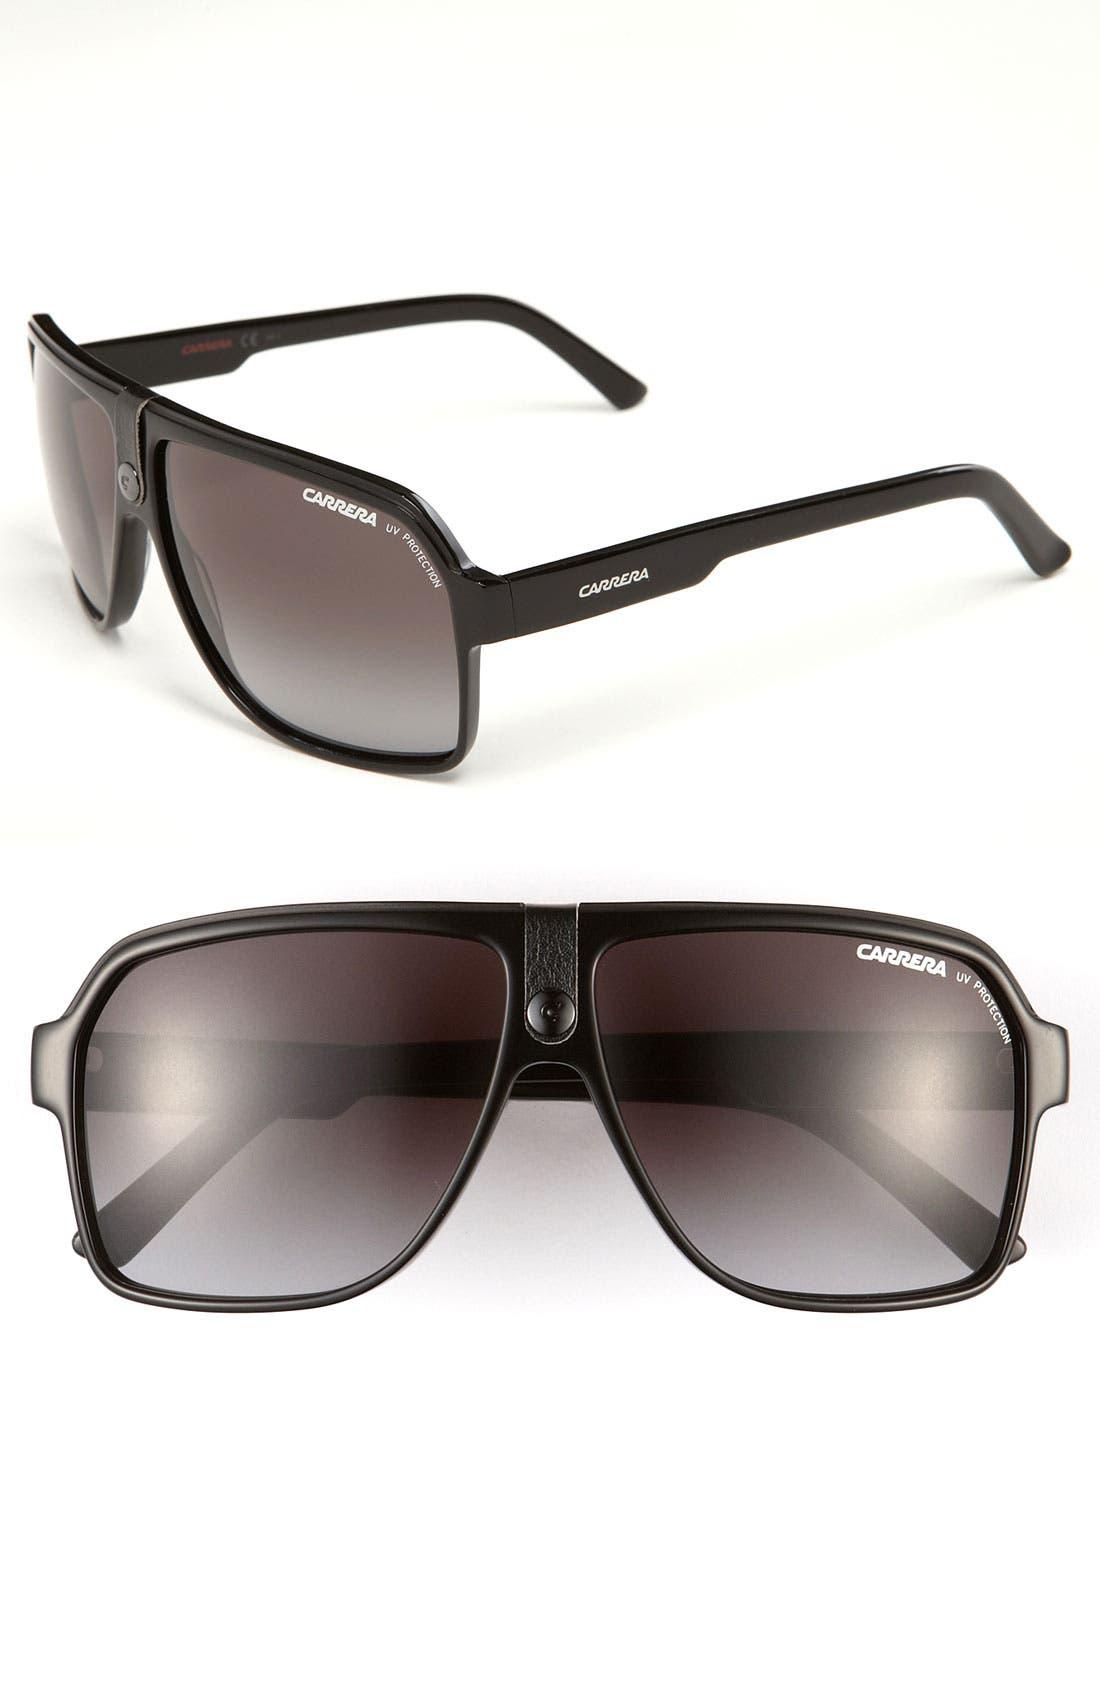 Carrera Eyewear 62mm Aviator Sunglasses